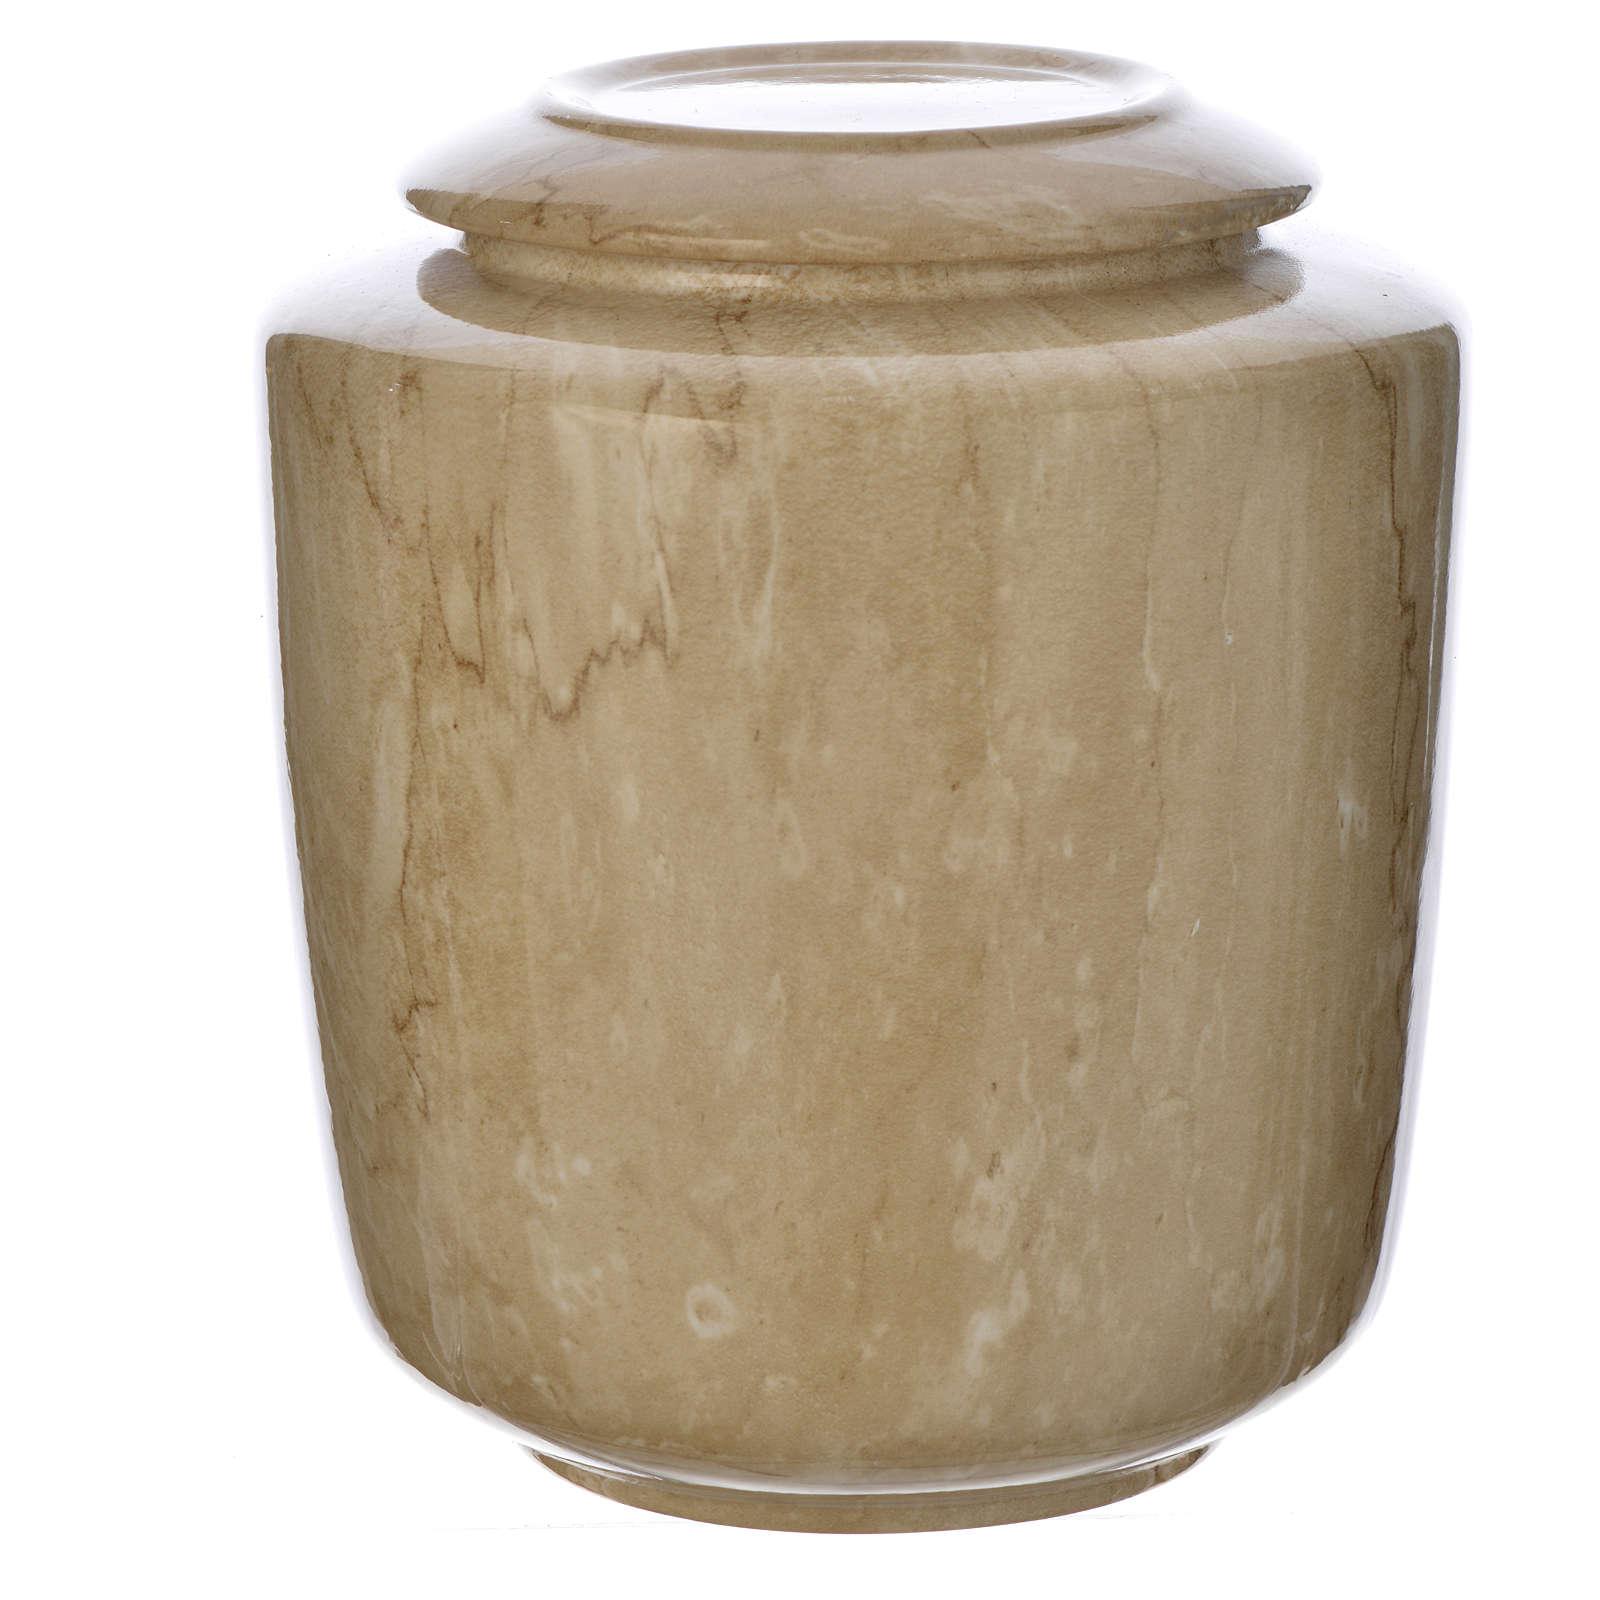 Urna funeraria porcellana mod. Botticino 3